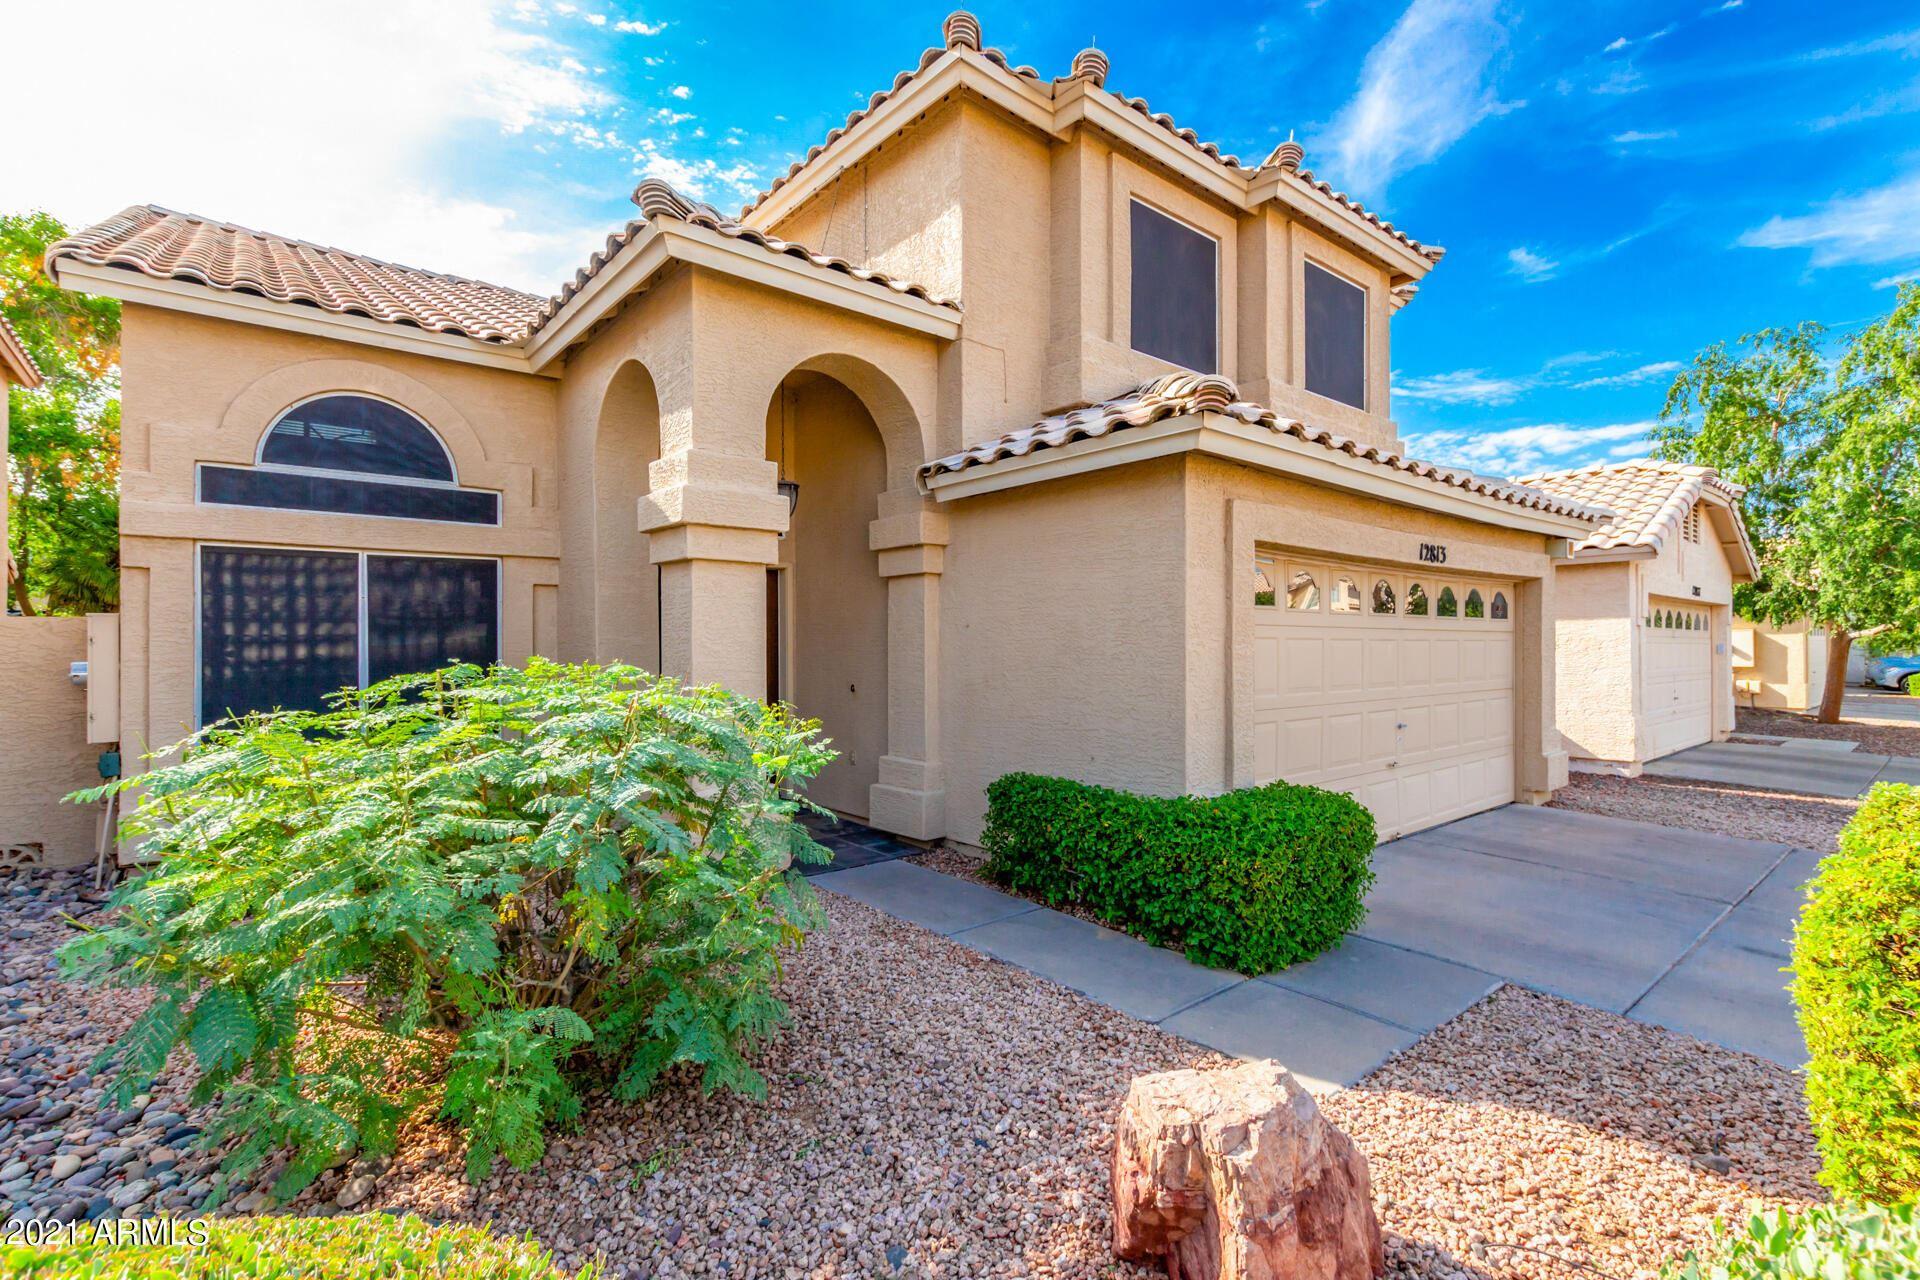 12813 S 45TH Street, Phoenix, AZ 85044 - MLS#: 6266317